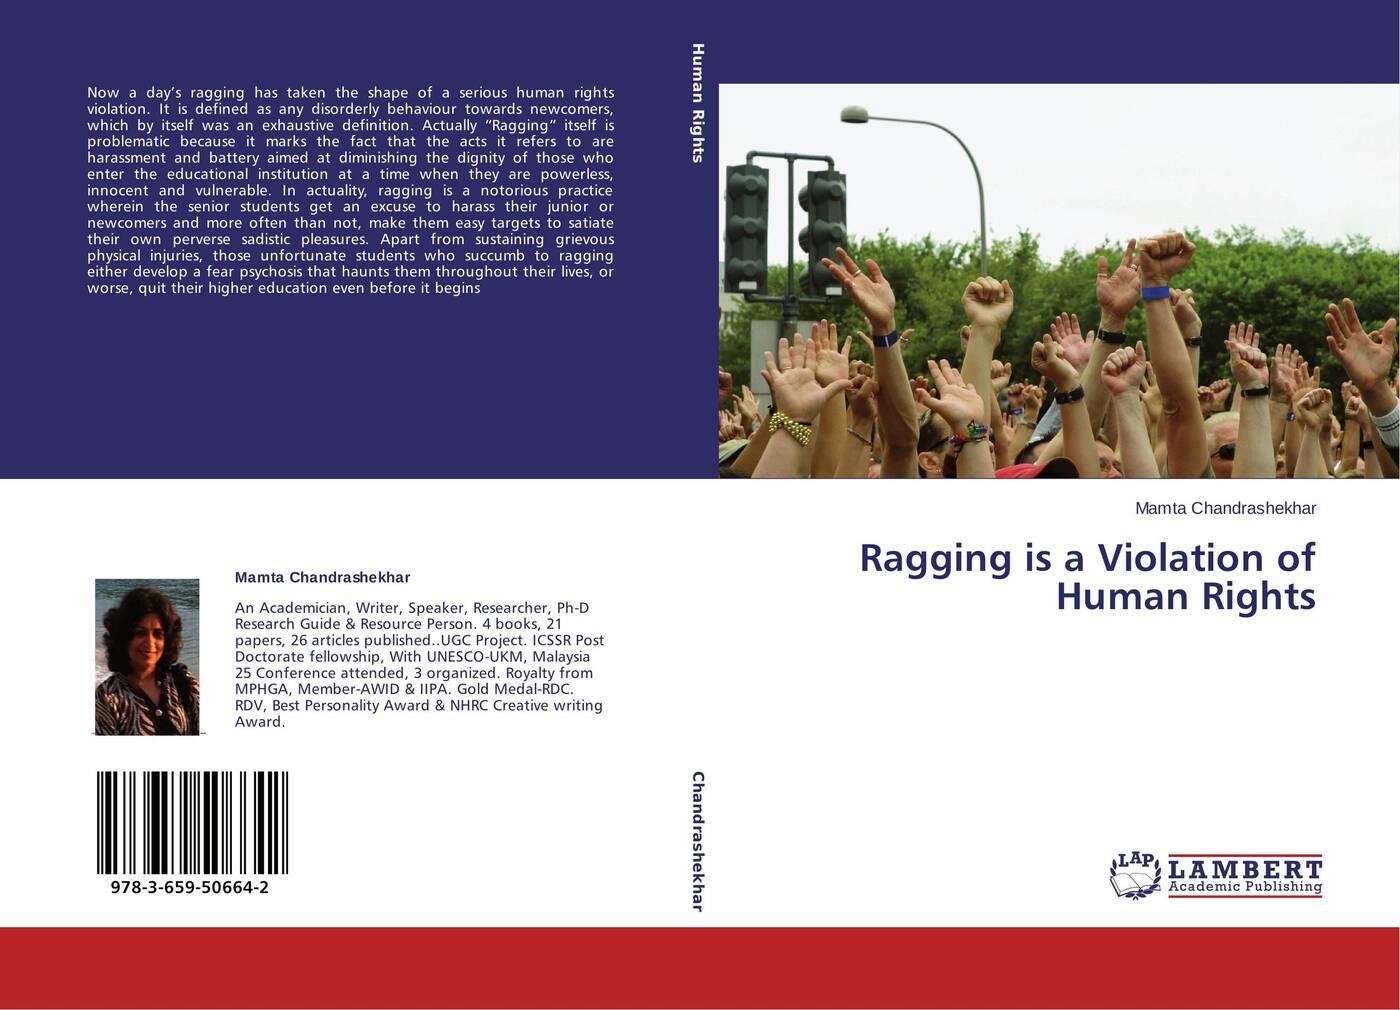 Mamta Chandrashekhar Ragging is a Violation of Human Rights kolber adél sanctions alleviating or deepening the violation of human rights